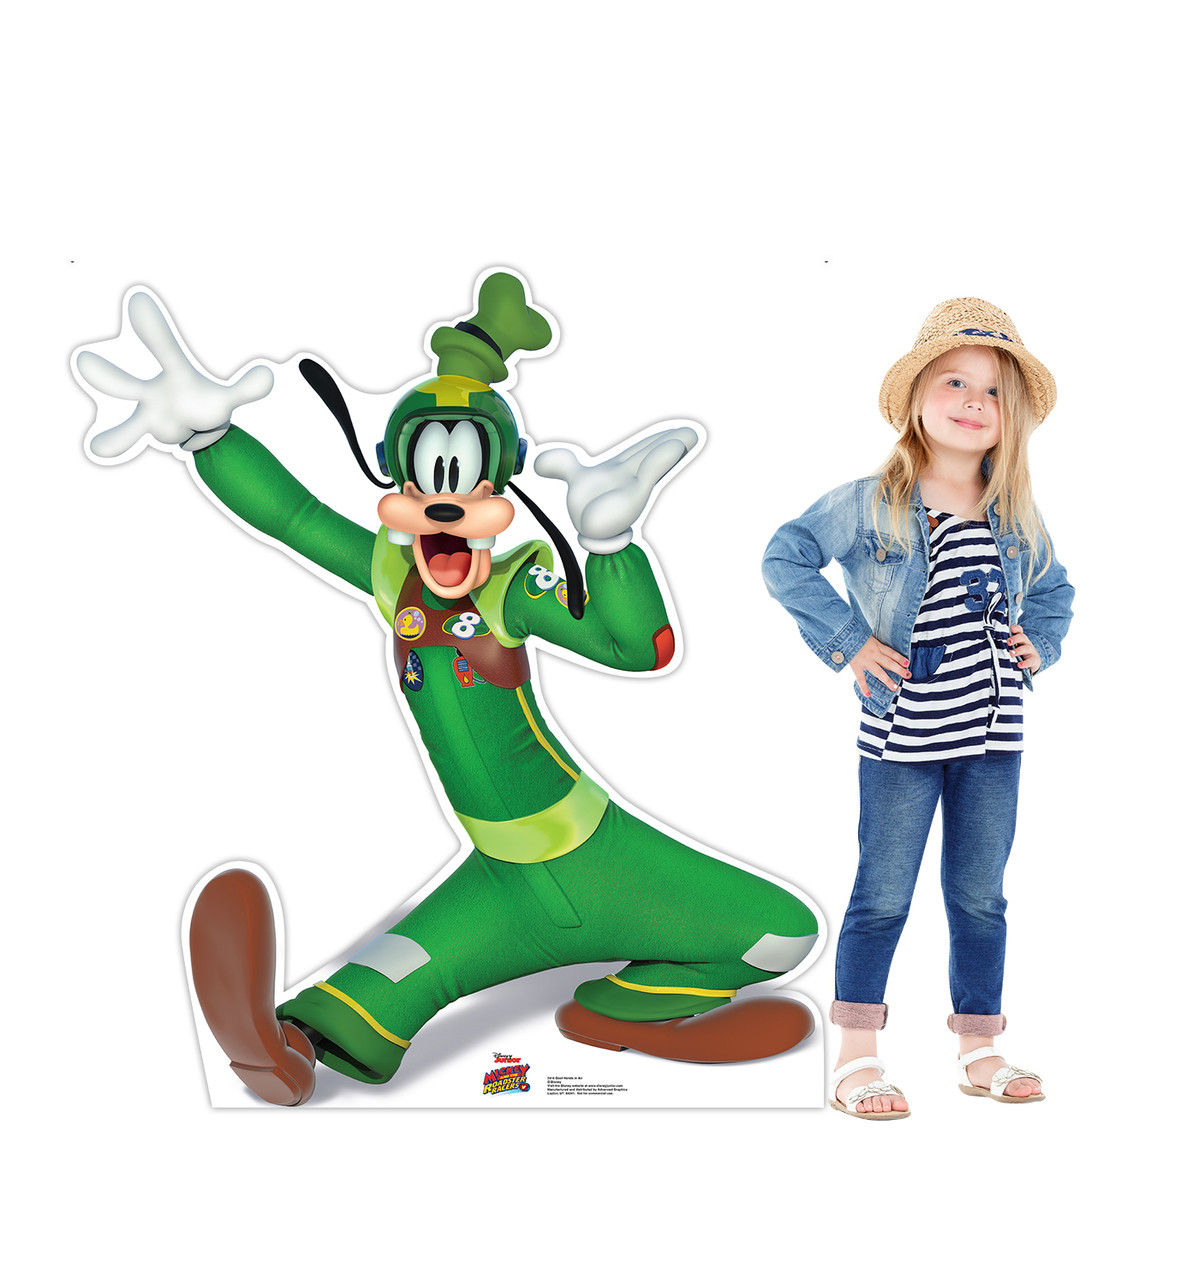 Life-size Goofy Hands in Air (Disney's Roadster Racers) Cardboard Standup 2